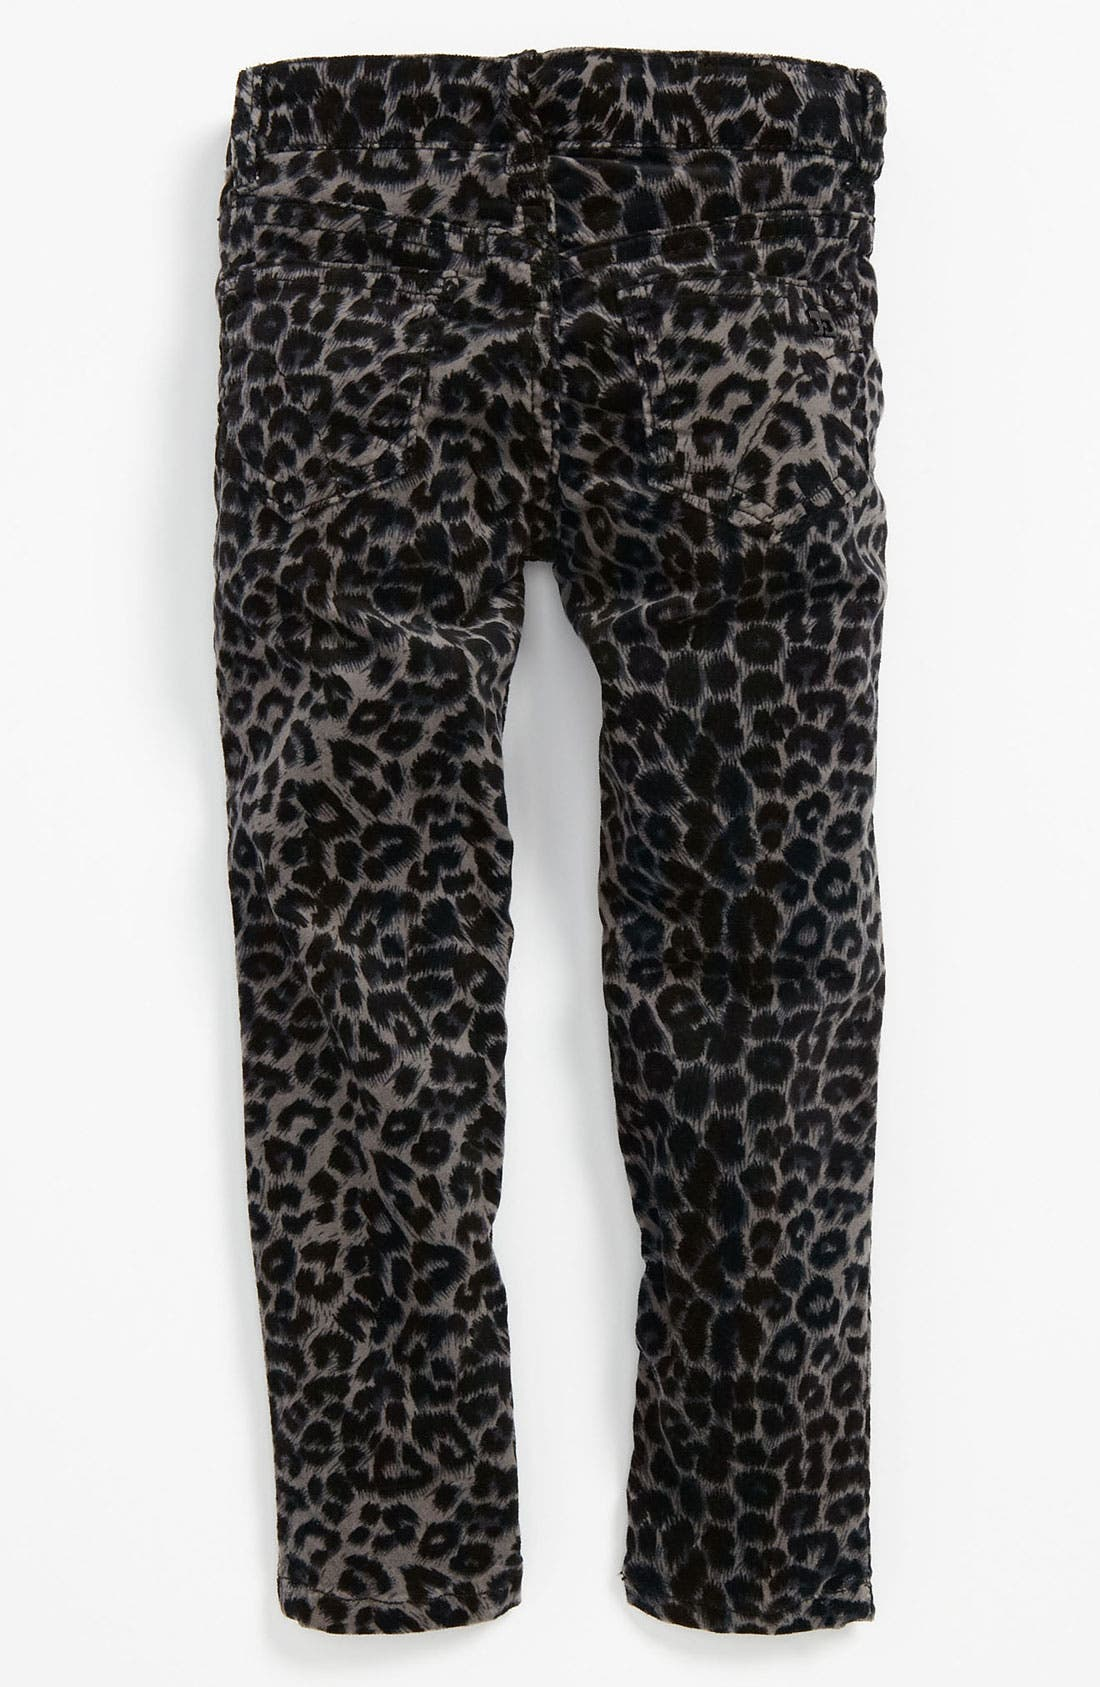 Alternate Image 1 Selected - Joe's Stretch Skinny Animal Print Velvet Denim Pants (Toddler)